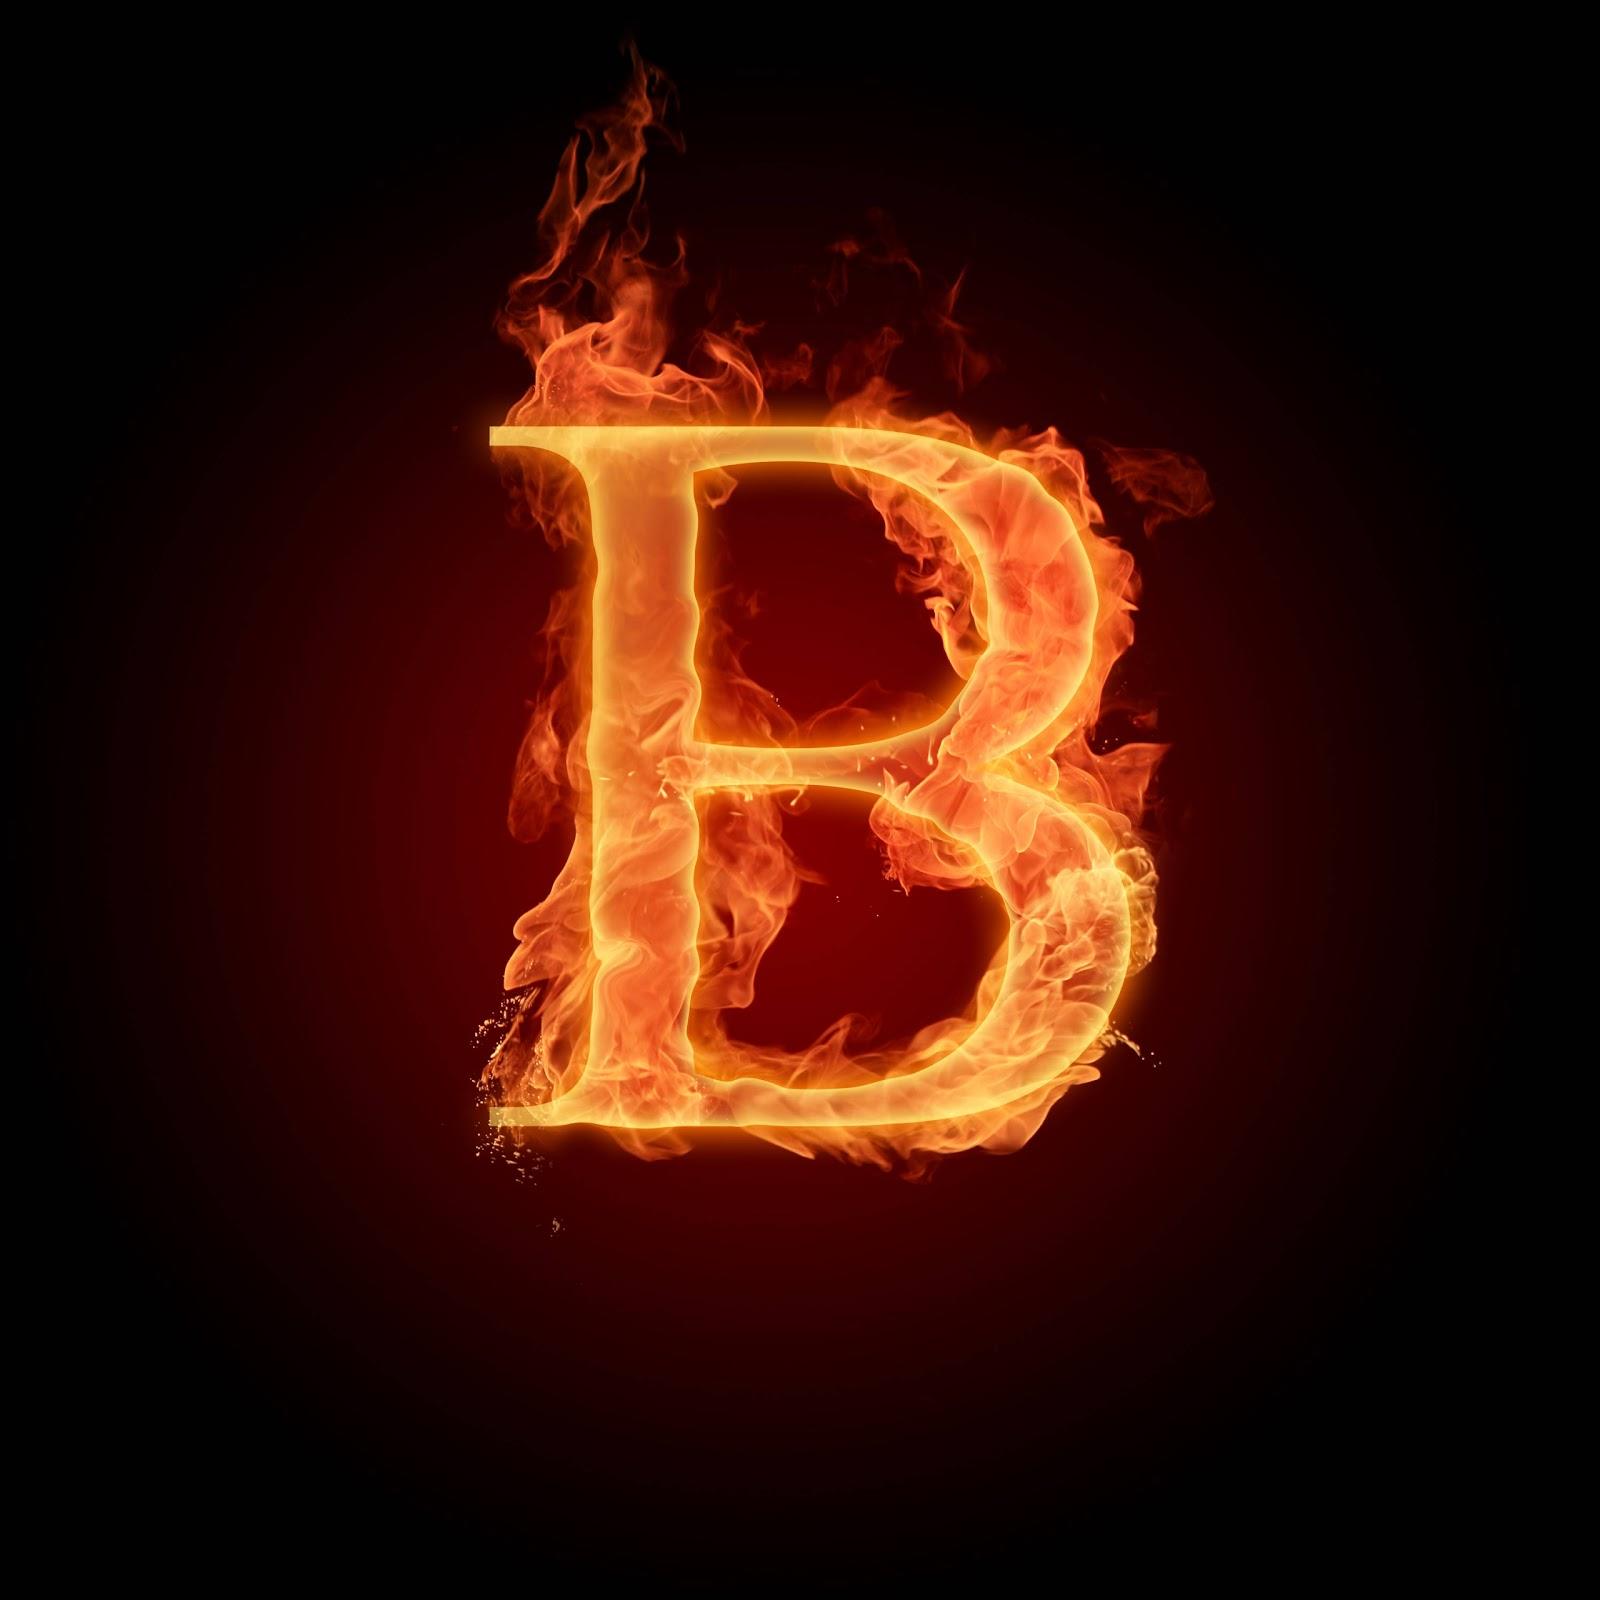 http://3.bp.blogspot.com/-cim1lWcNjkU/UB0ySzM619I/AAAAAAAAAI8/FQqJSRhqQnw/s1600/Burning%252BAlphabet%252BWallpaper%252BB.jpg